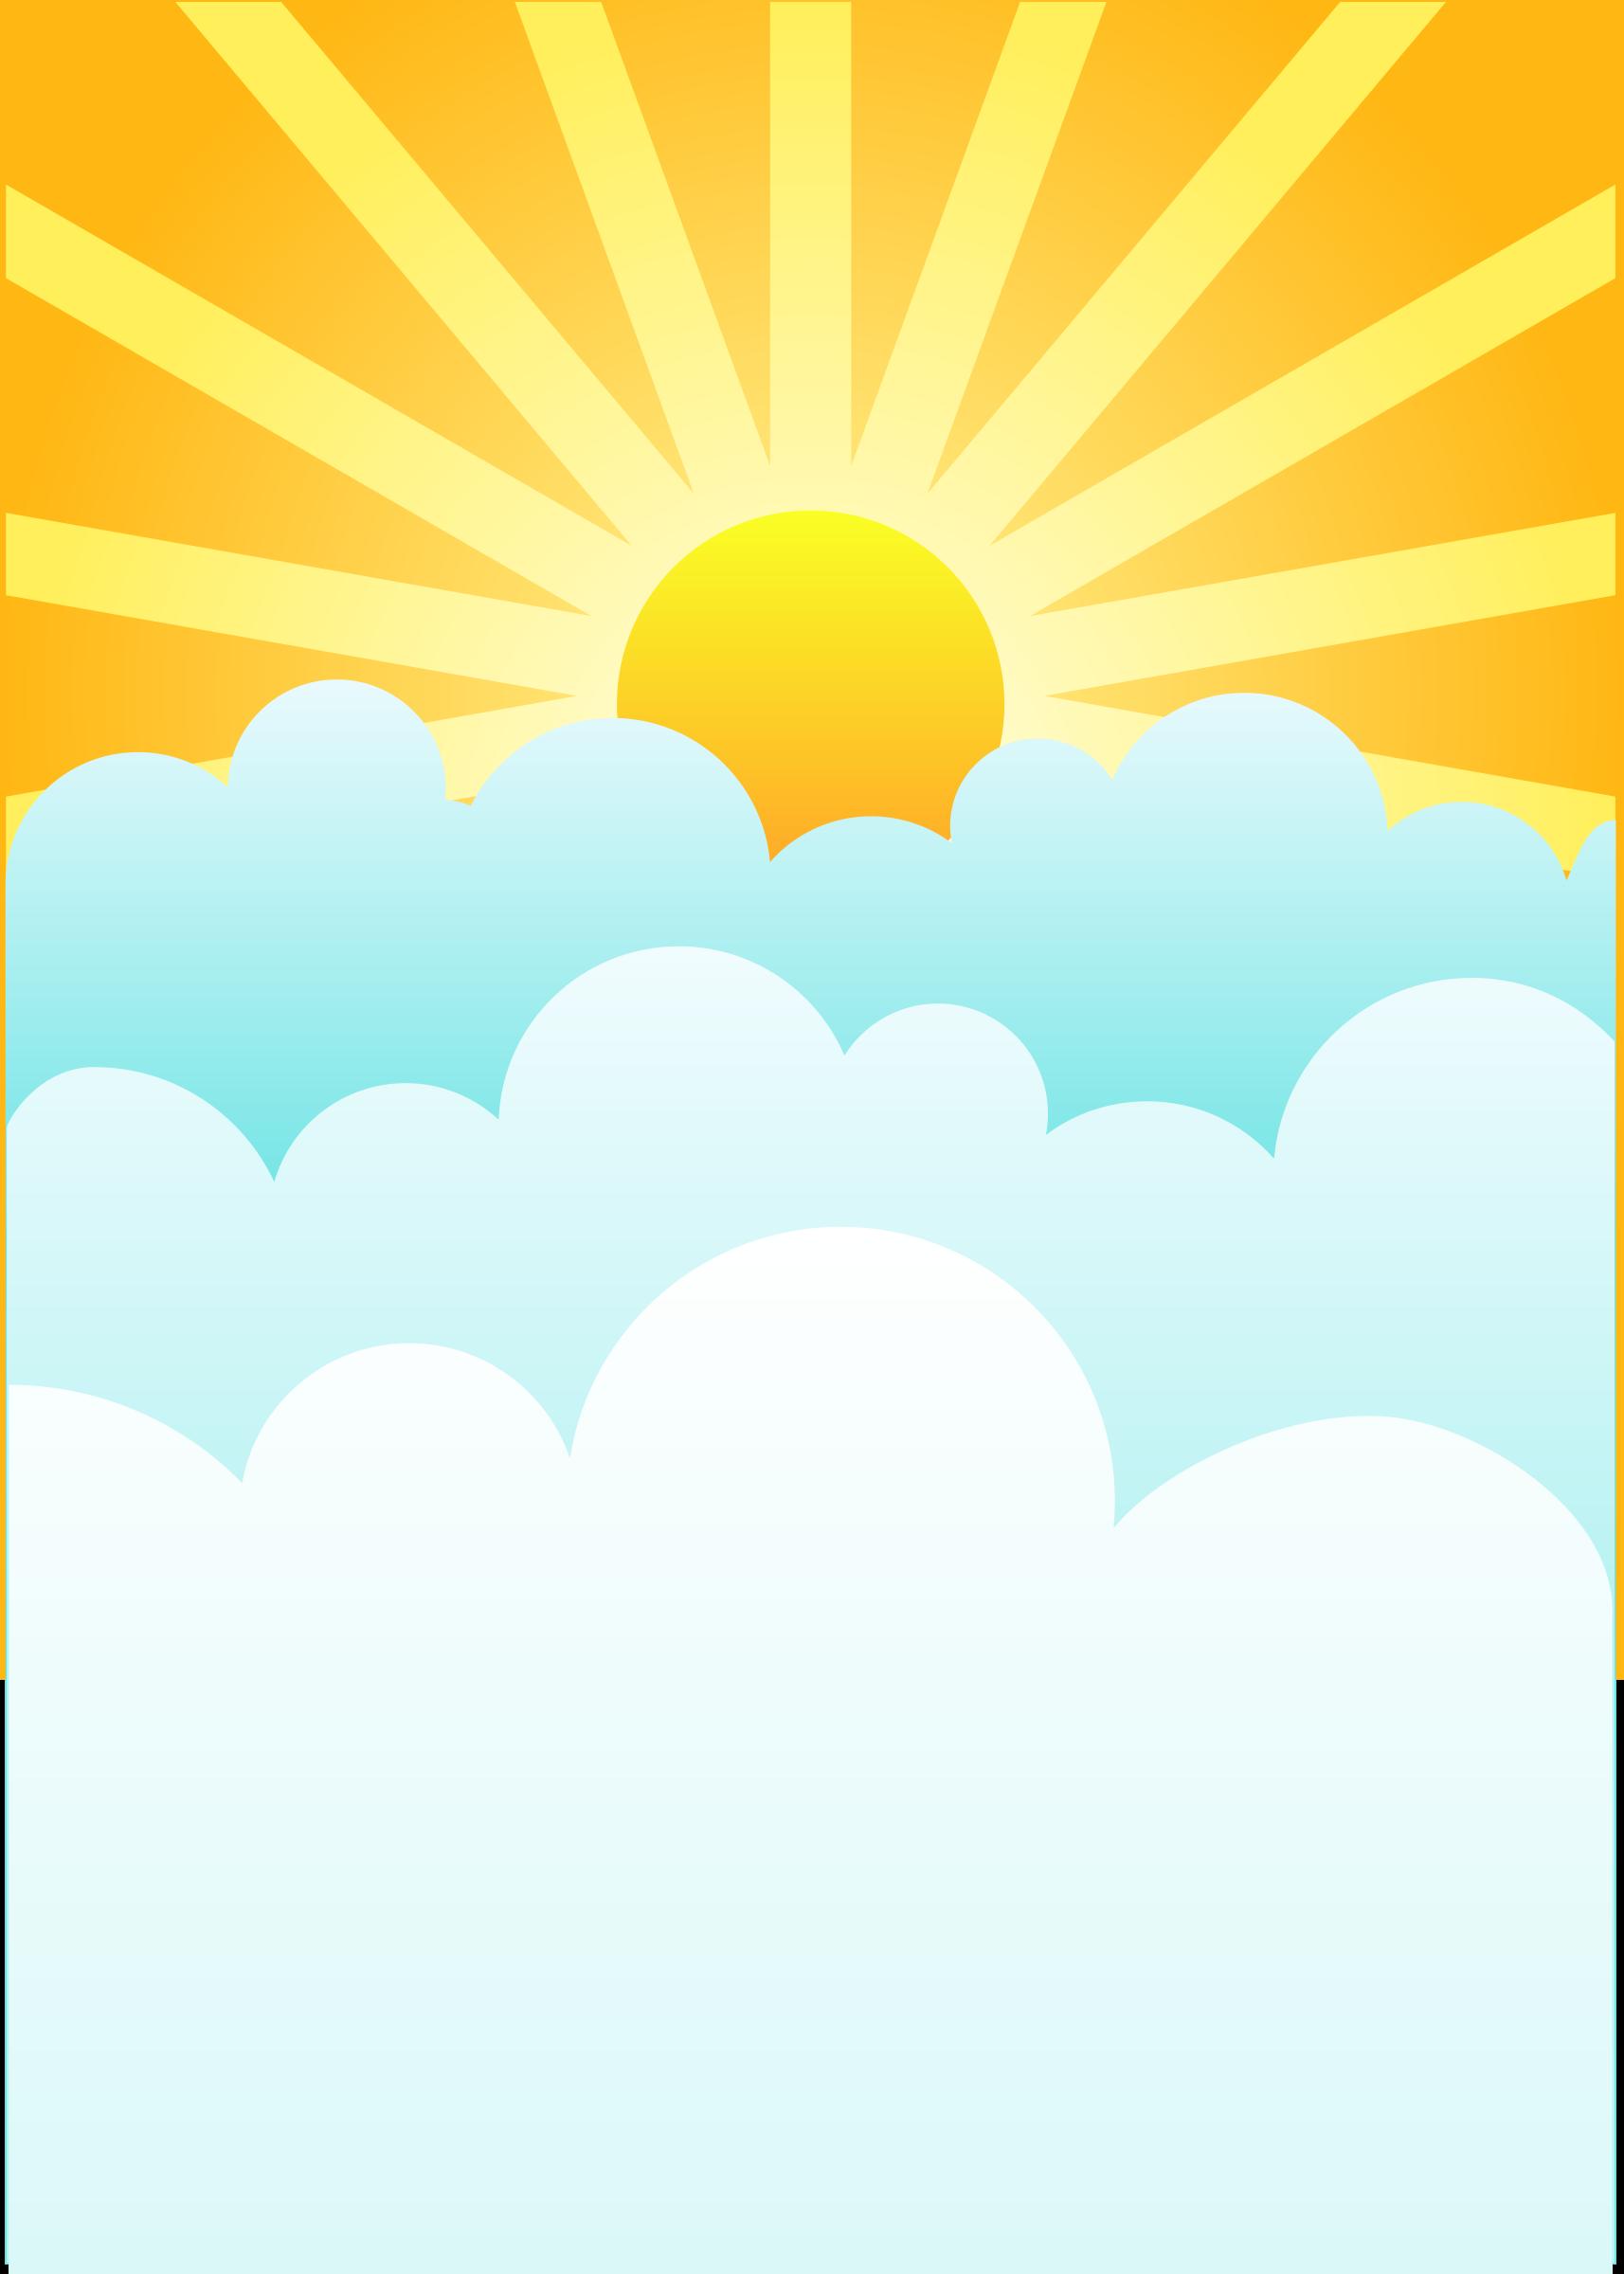 Free Rising Sun Cliparts, Download Free Clip Art, Free Clip.